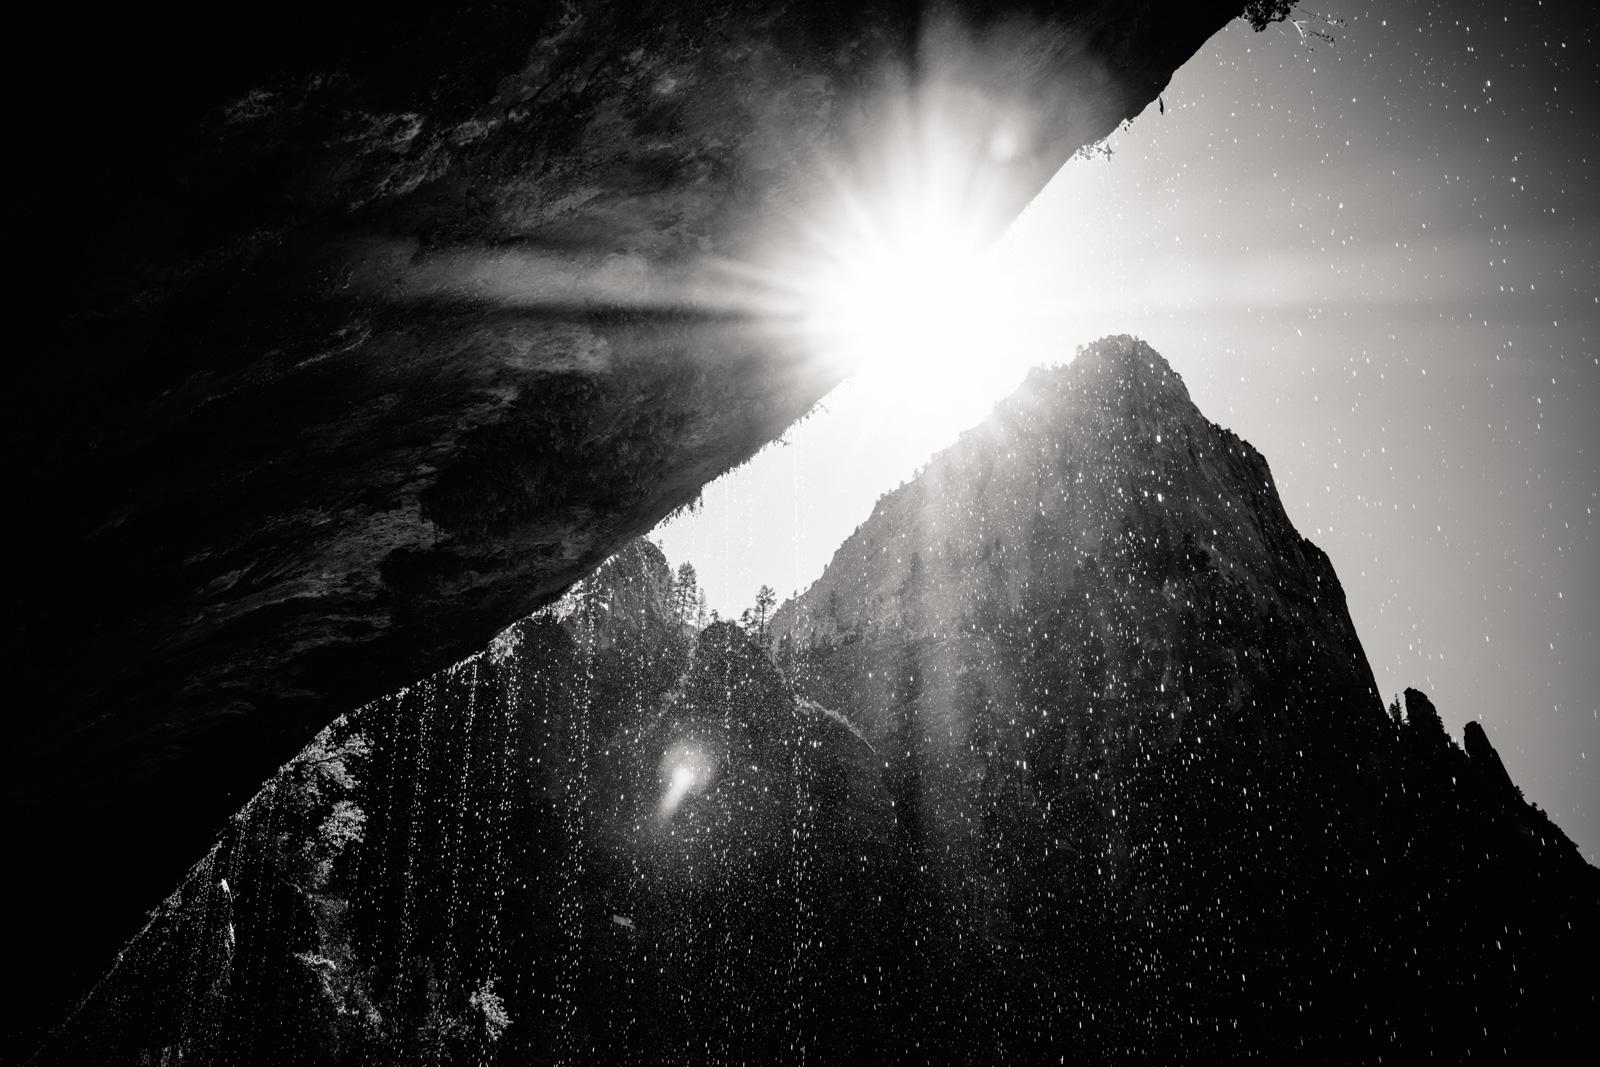 Weeping Rock, Zion National Park. November 2016.